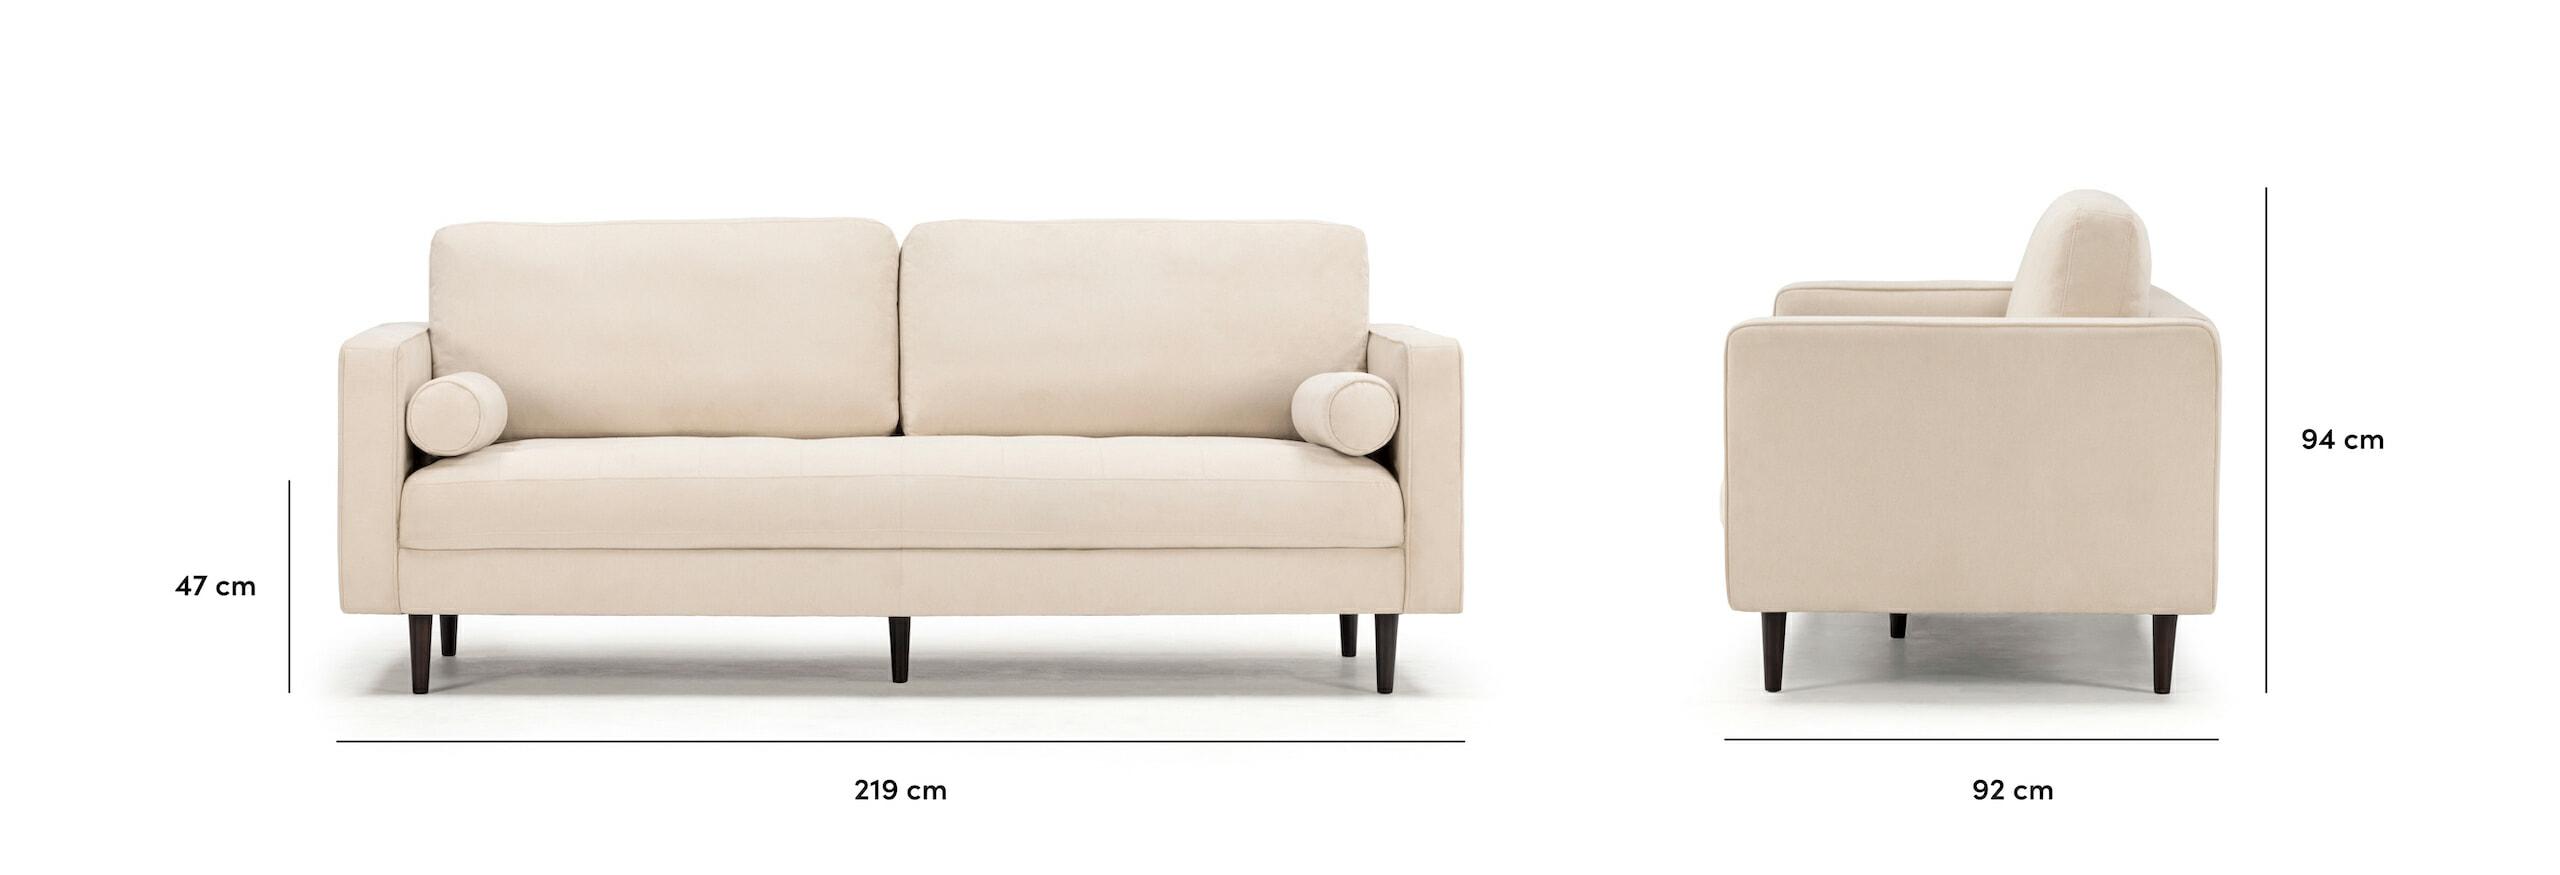 Soho sofa dimensions